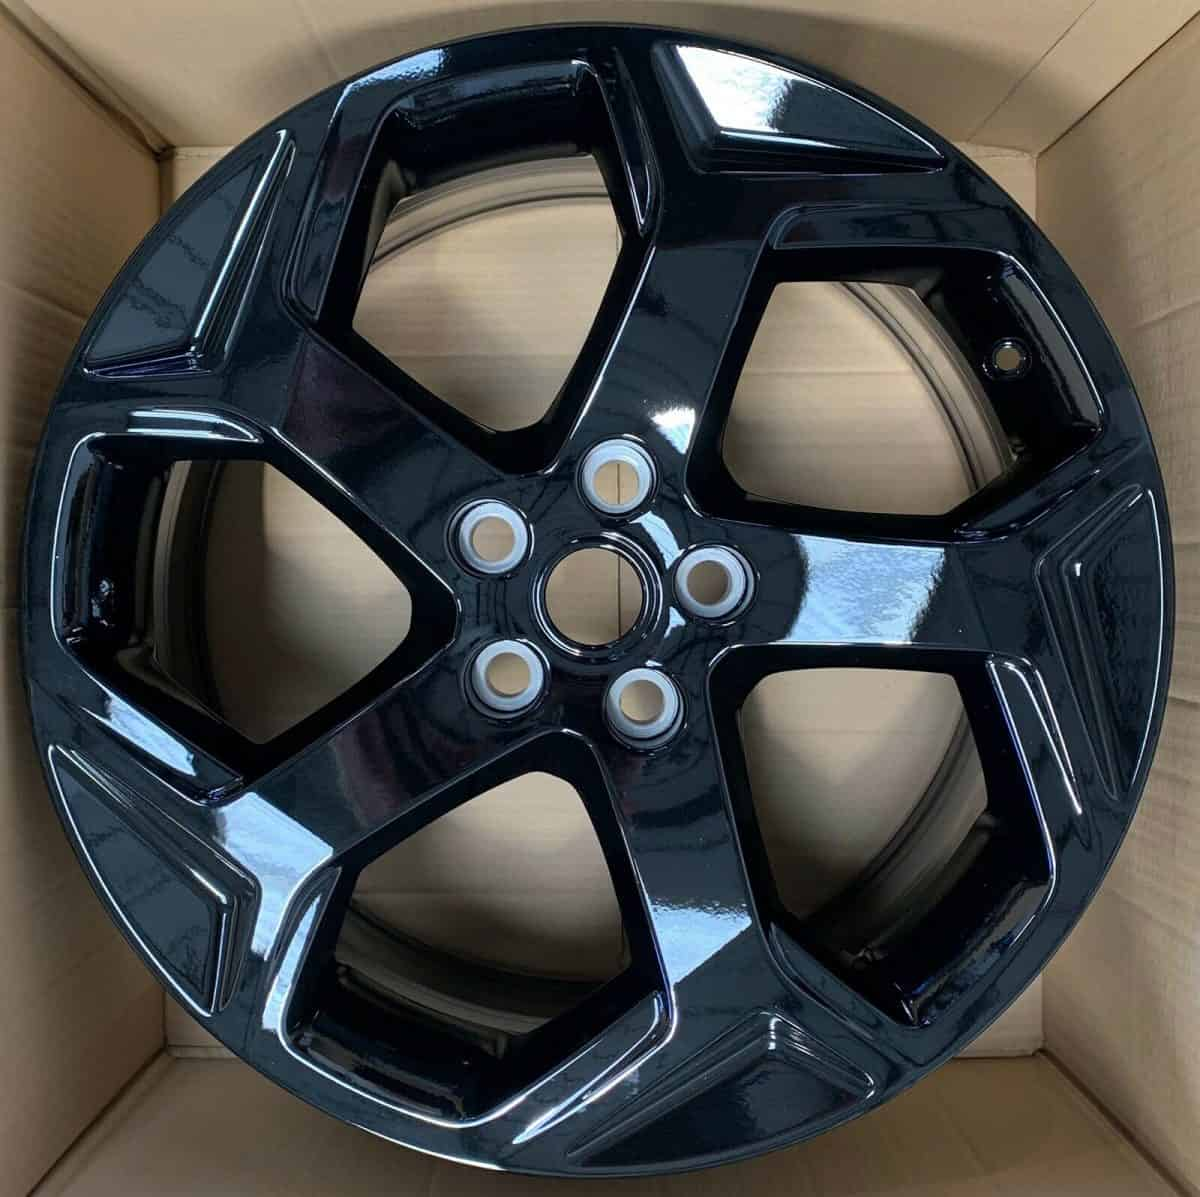 "Genuine Land Rover Range Rover Style Style 5084 20"" inch 5 Split-Spoke Alloy Wheels with Gloss Black Finish LR099135"